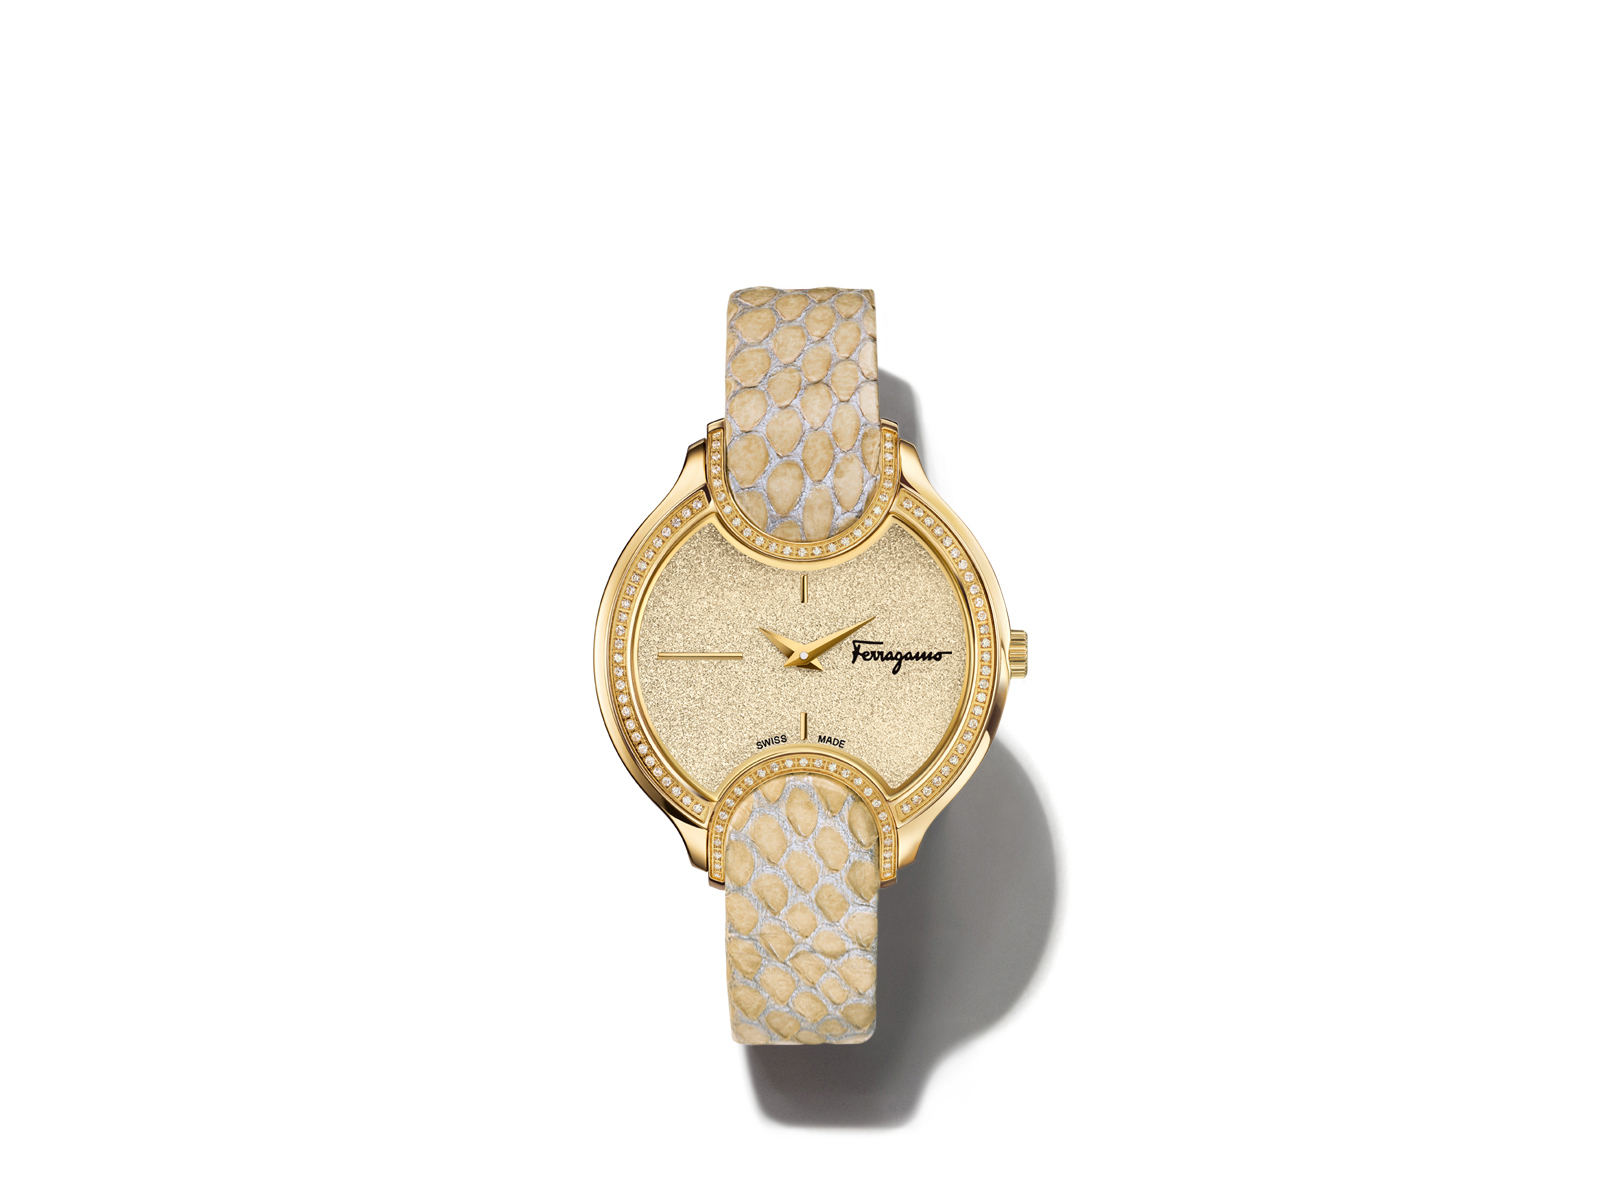 Luxusní hodinky Salvatore Ferragamo - Signature Collection